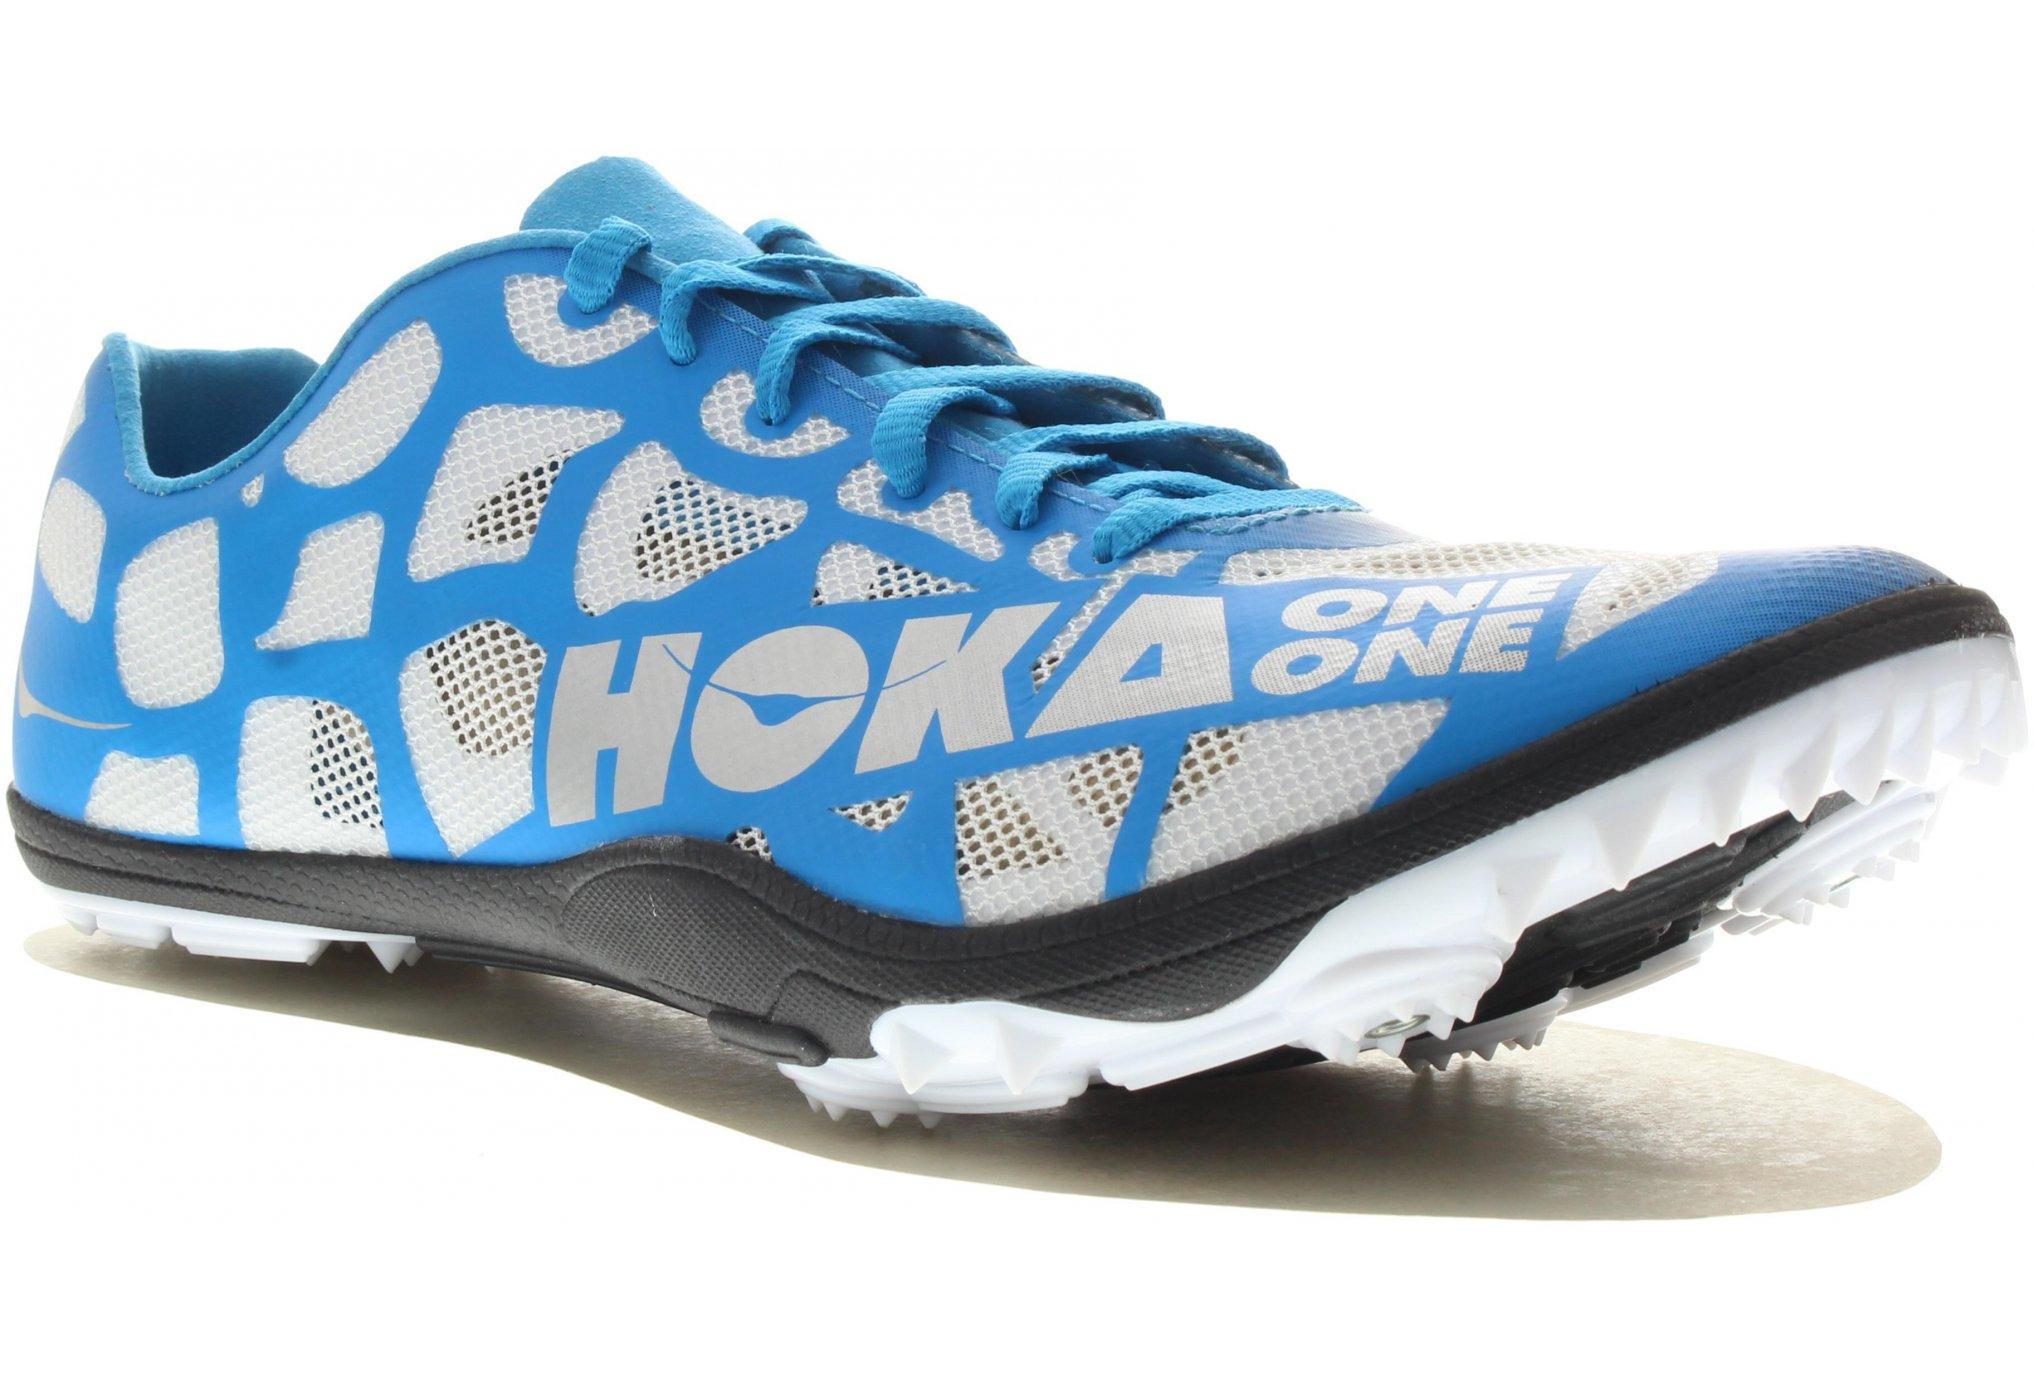 Hoka One One Rocket LD M Diététique Chaussures homme